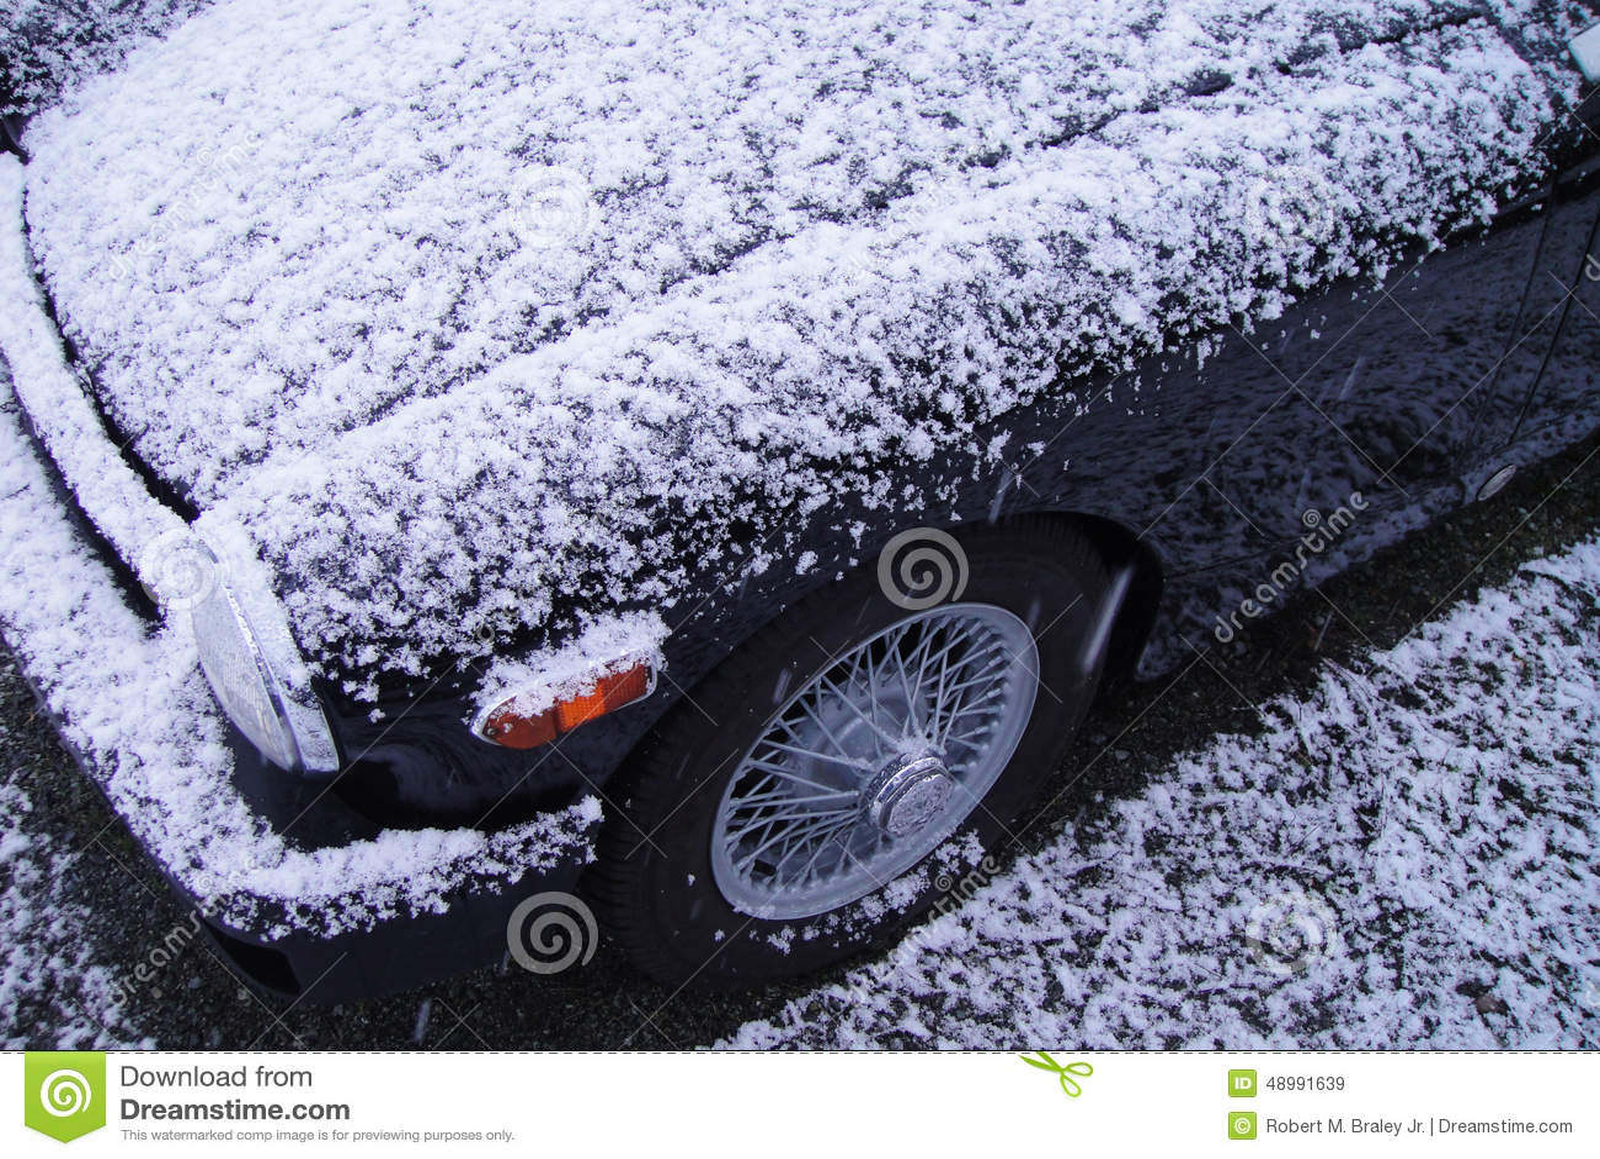 Snow Covered Black Vintage Car